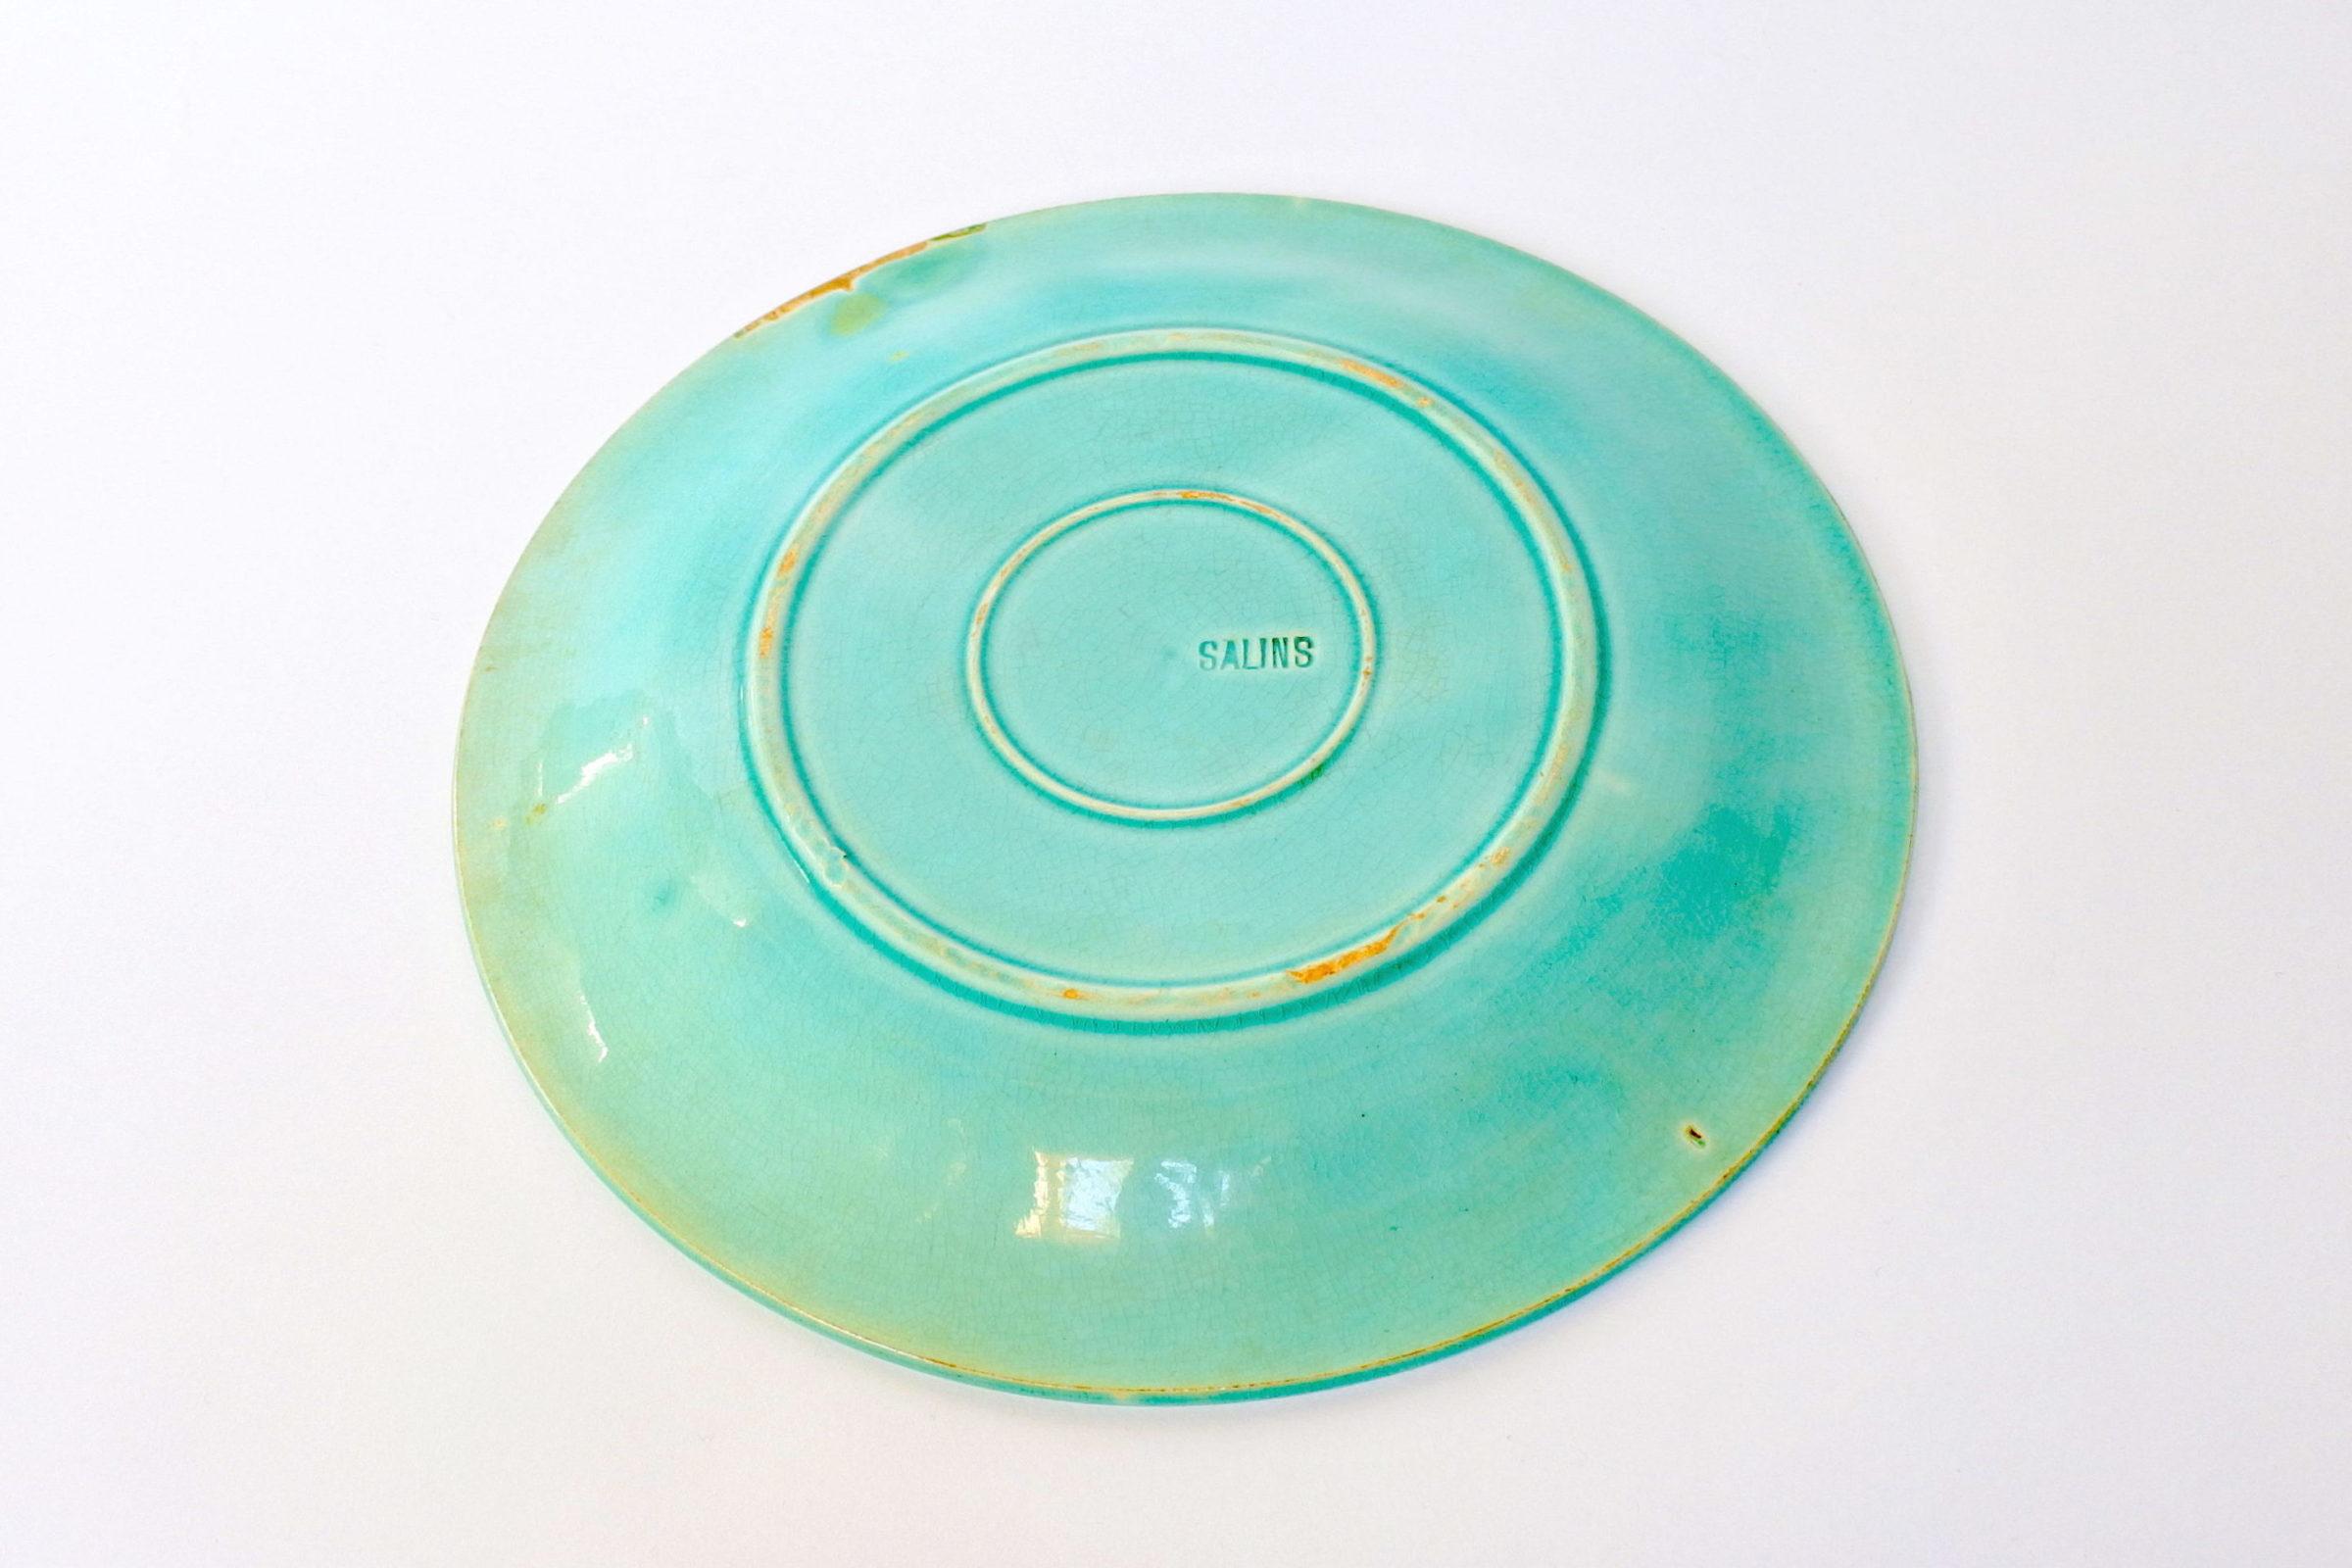 Piatto in ceramica barbotine - Manifattura Salins - 2